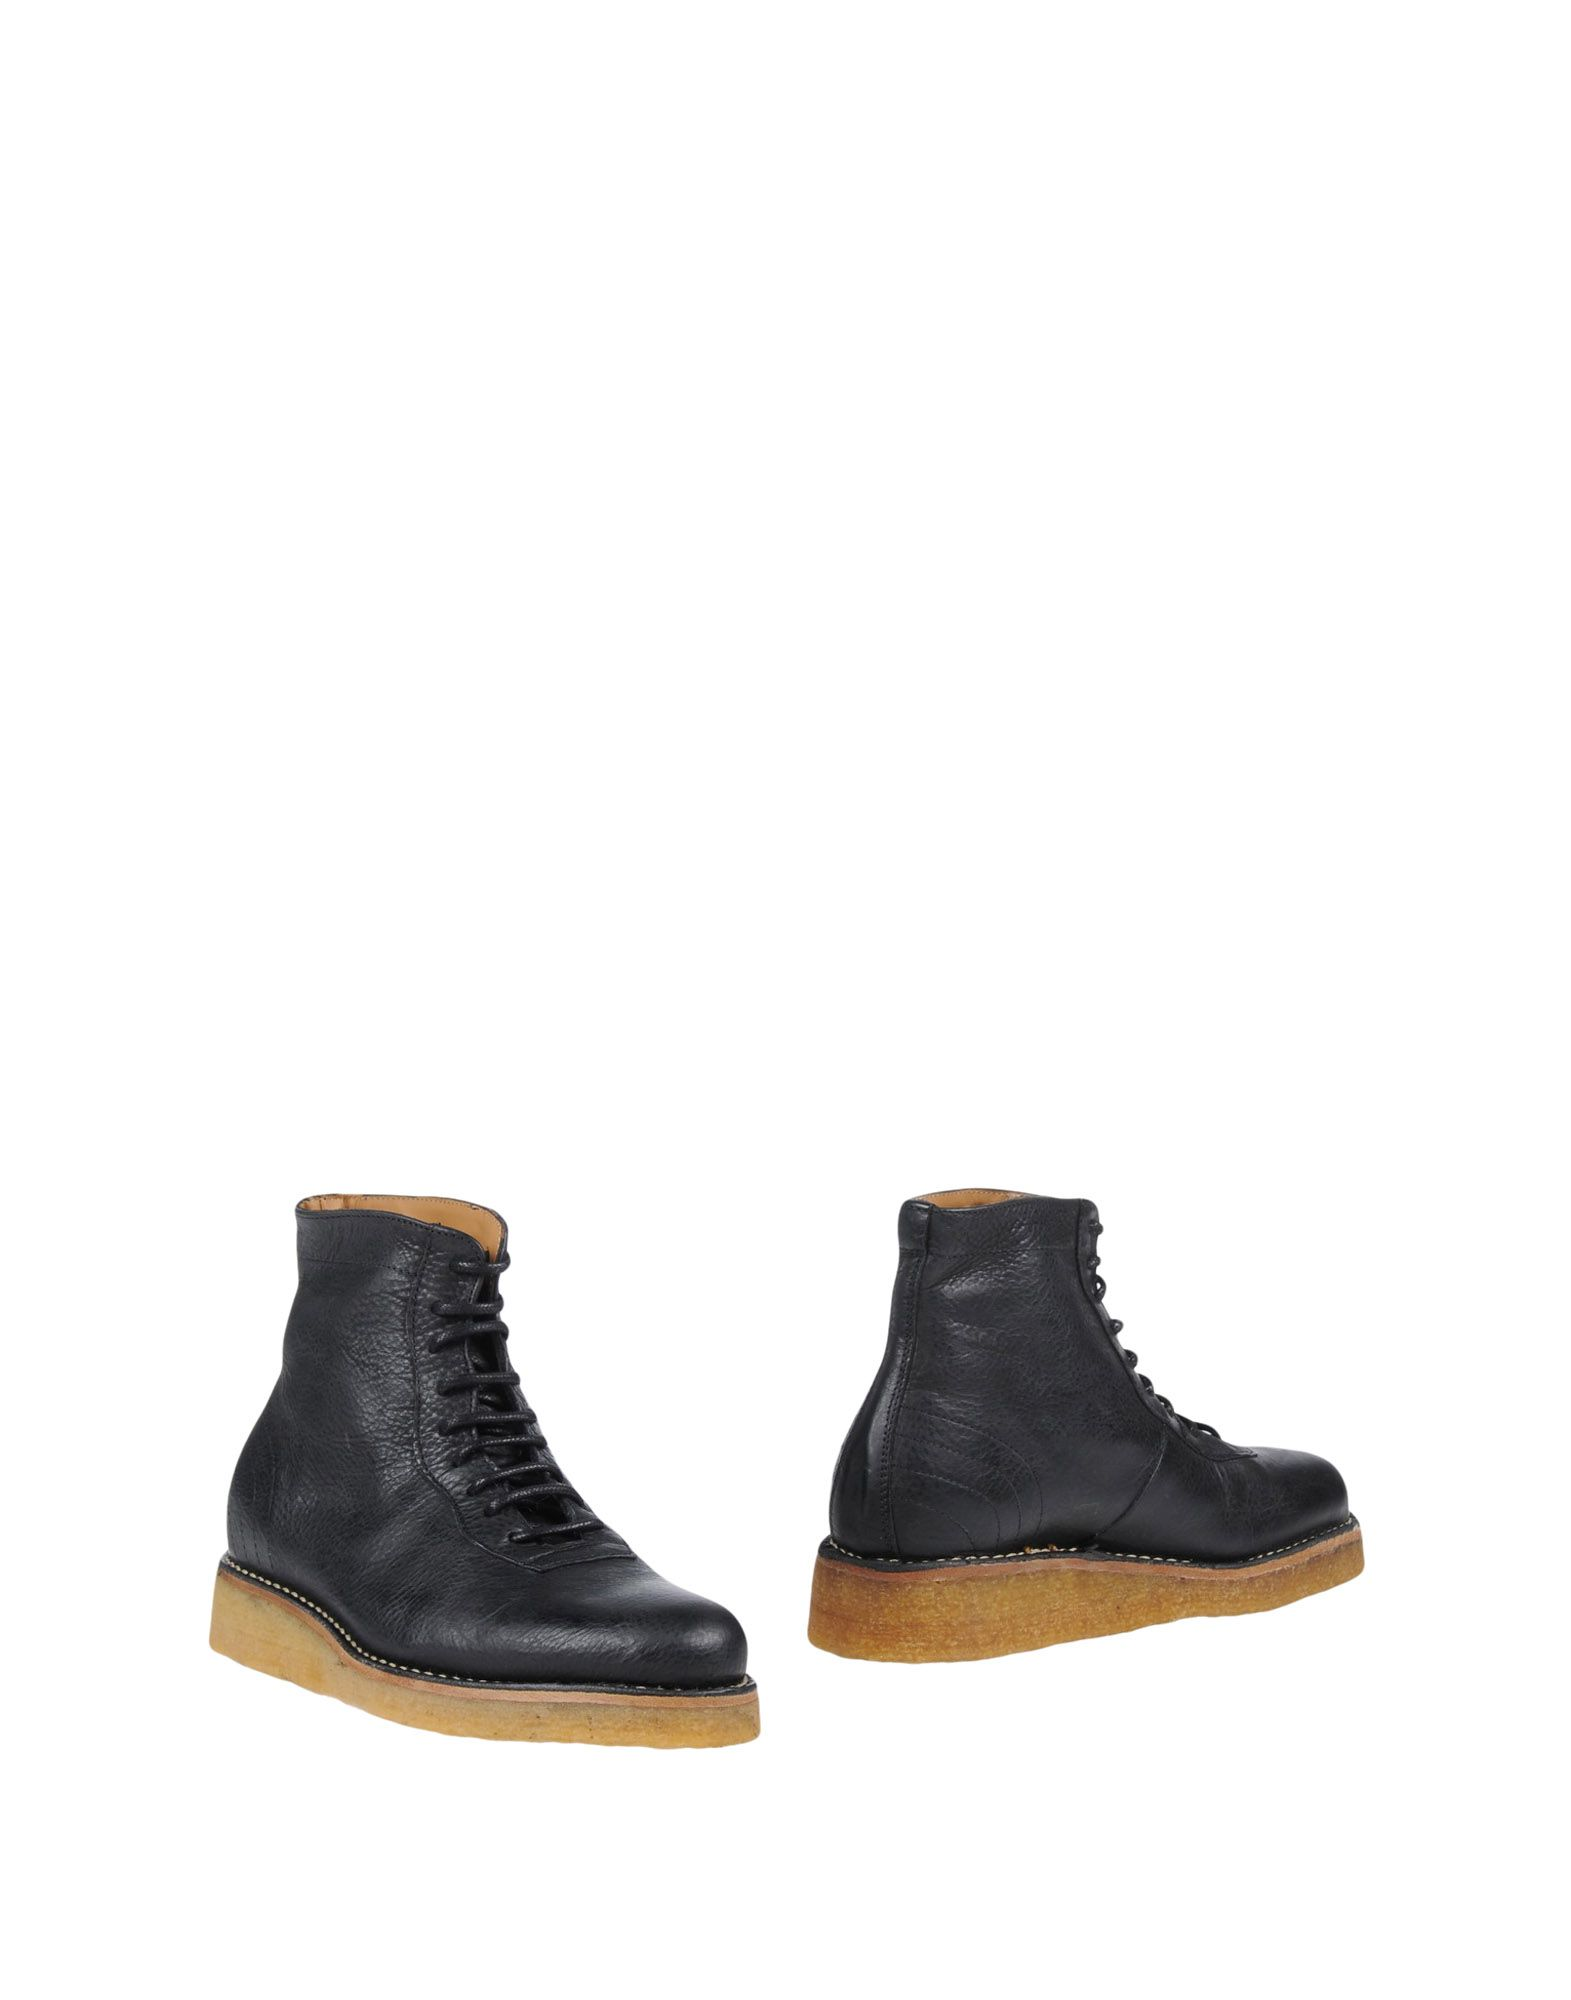 Stivaletti Pantofola D'oro Donna - 11456364IE